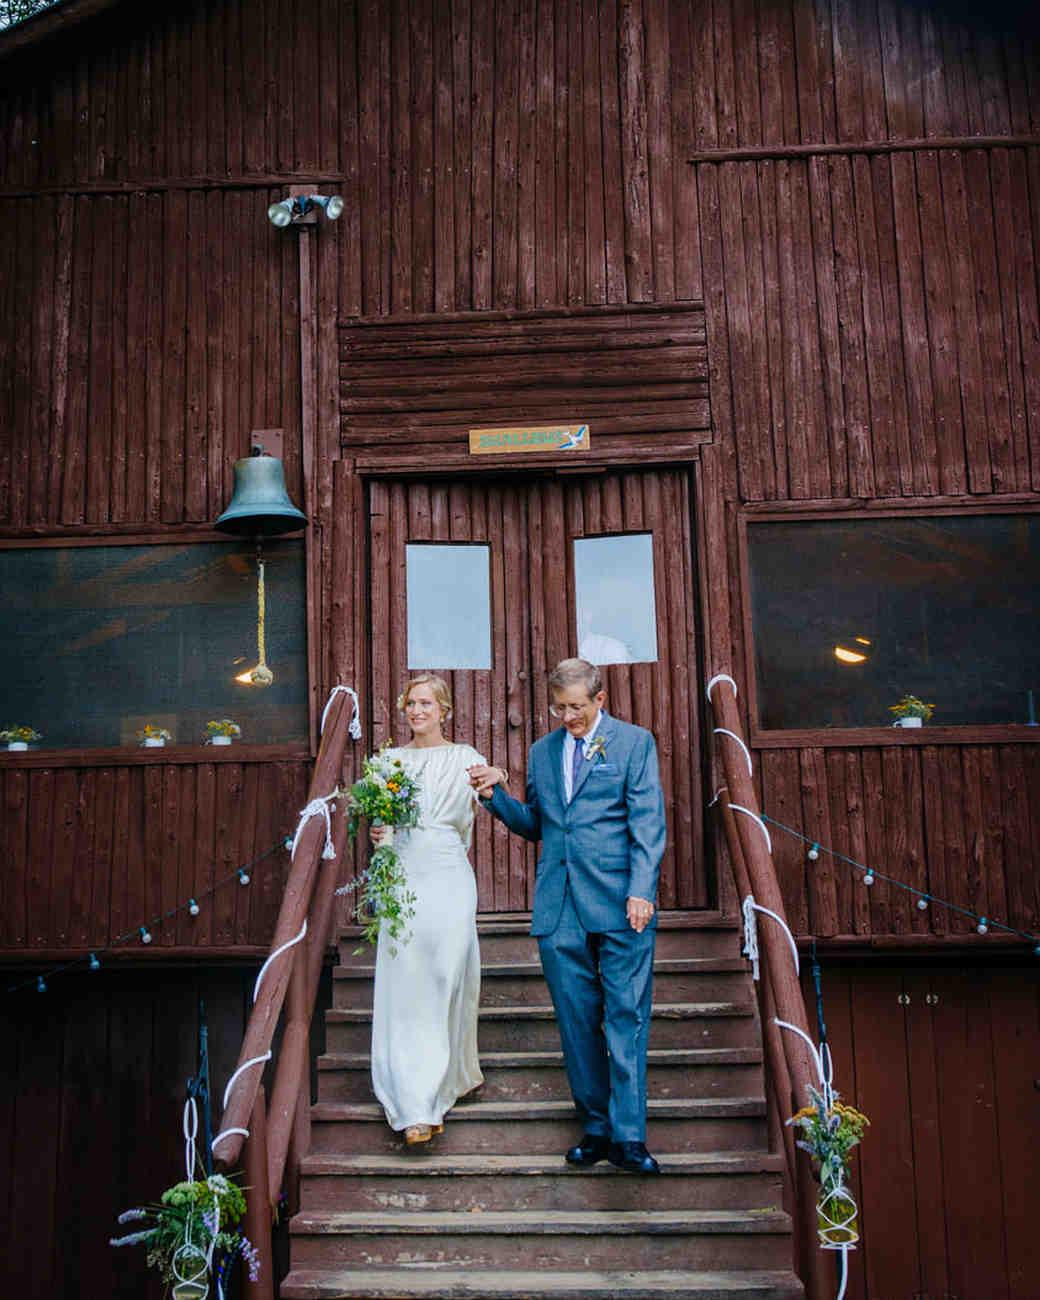 teresa-pepin-wedding-fatherdaughter-0514.jpg